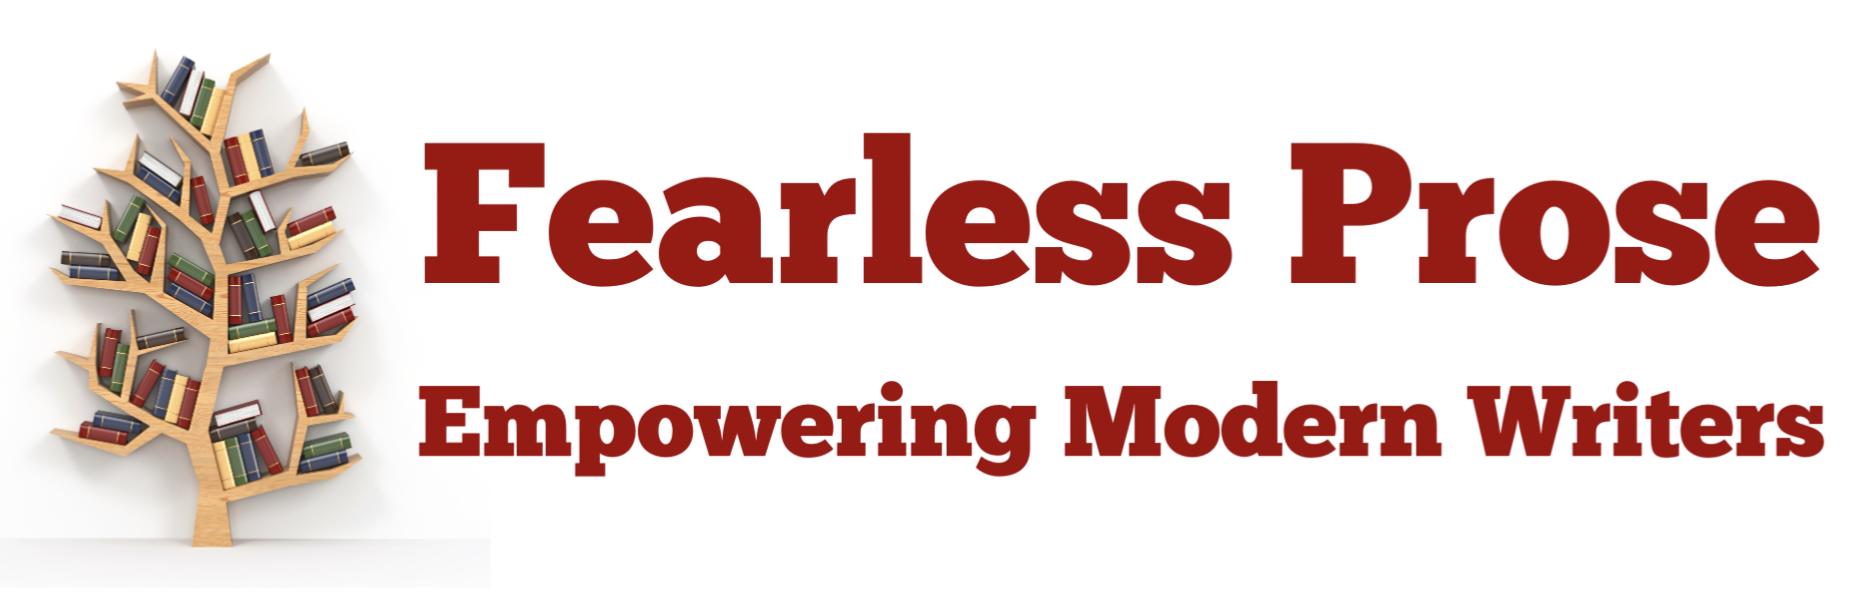 Fearless Prose - Empowering Modern Writers